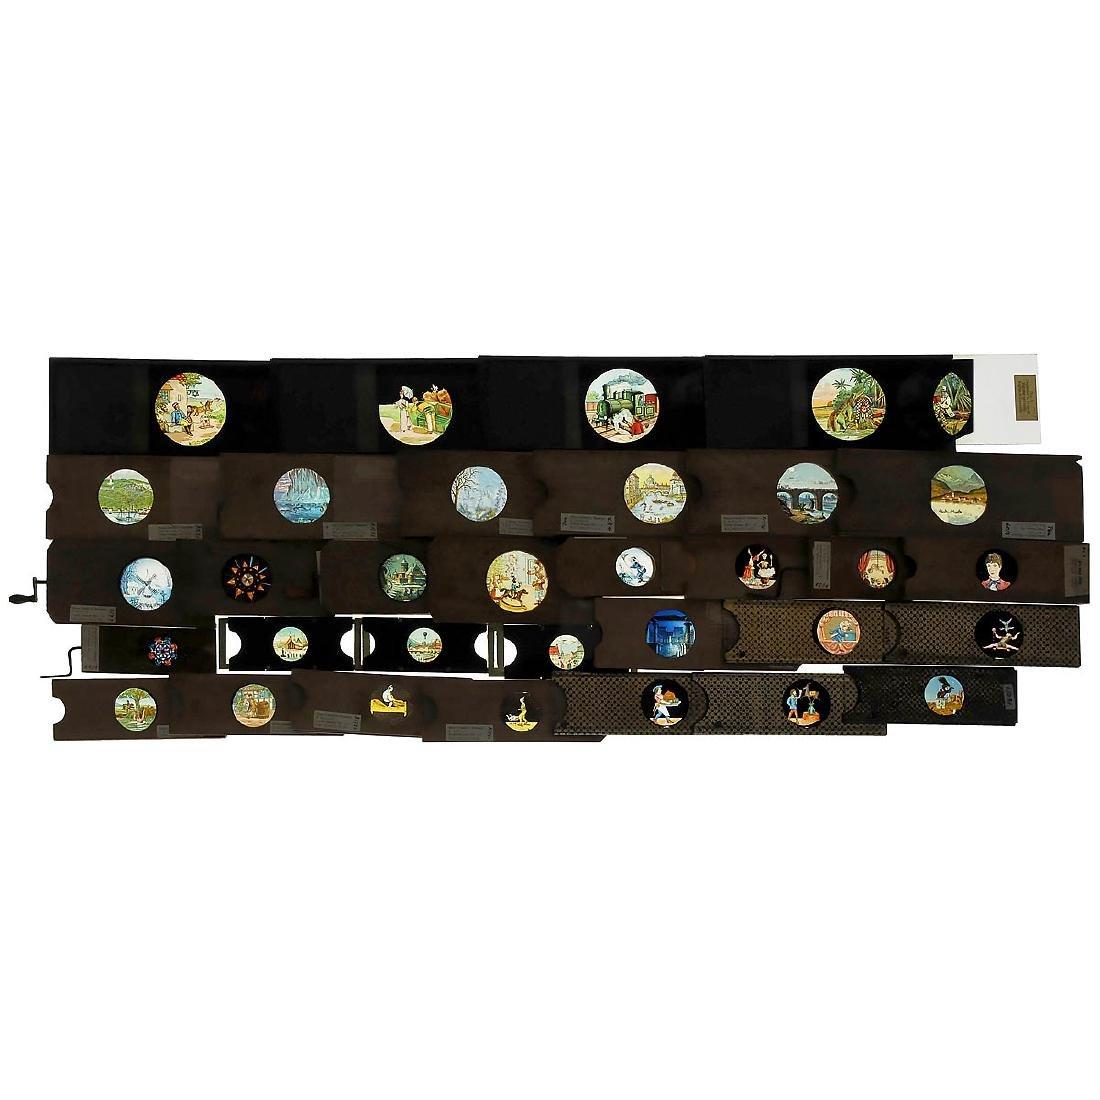 59 Mechanical Magic Lantern Slides in Wood Cases - 2